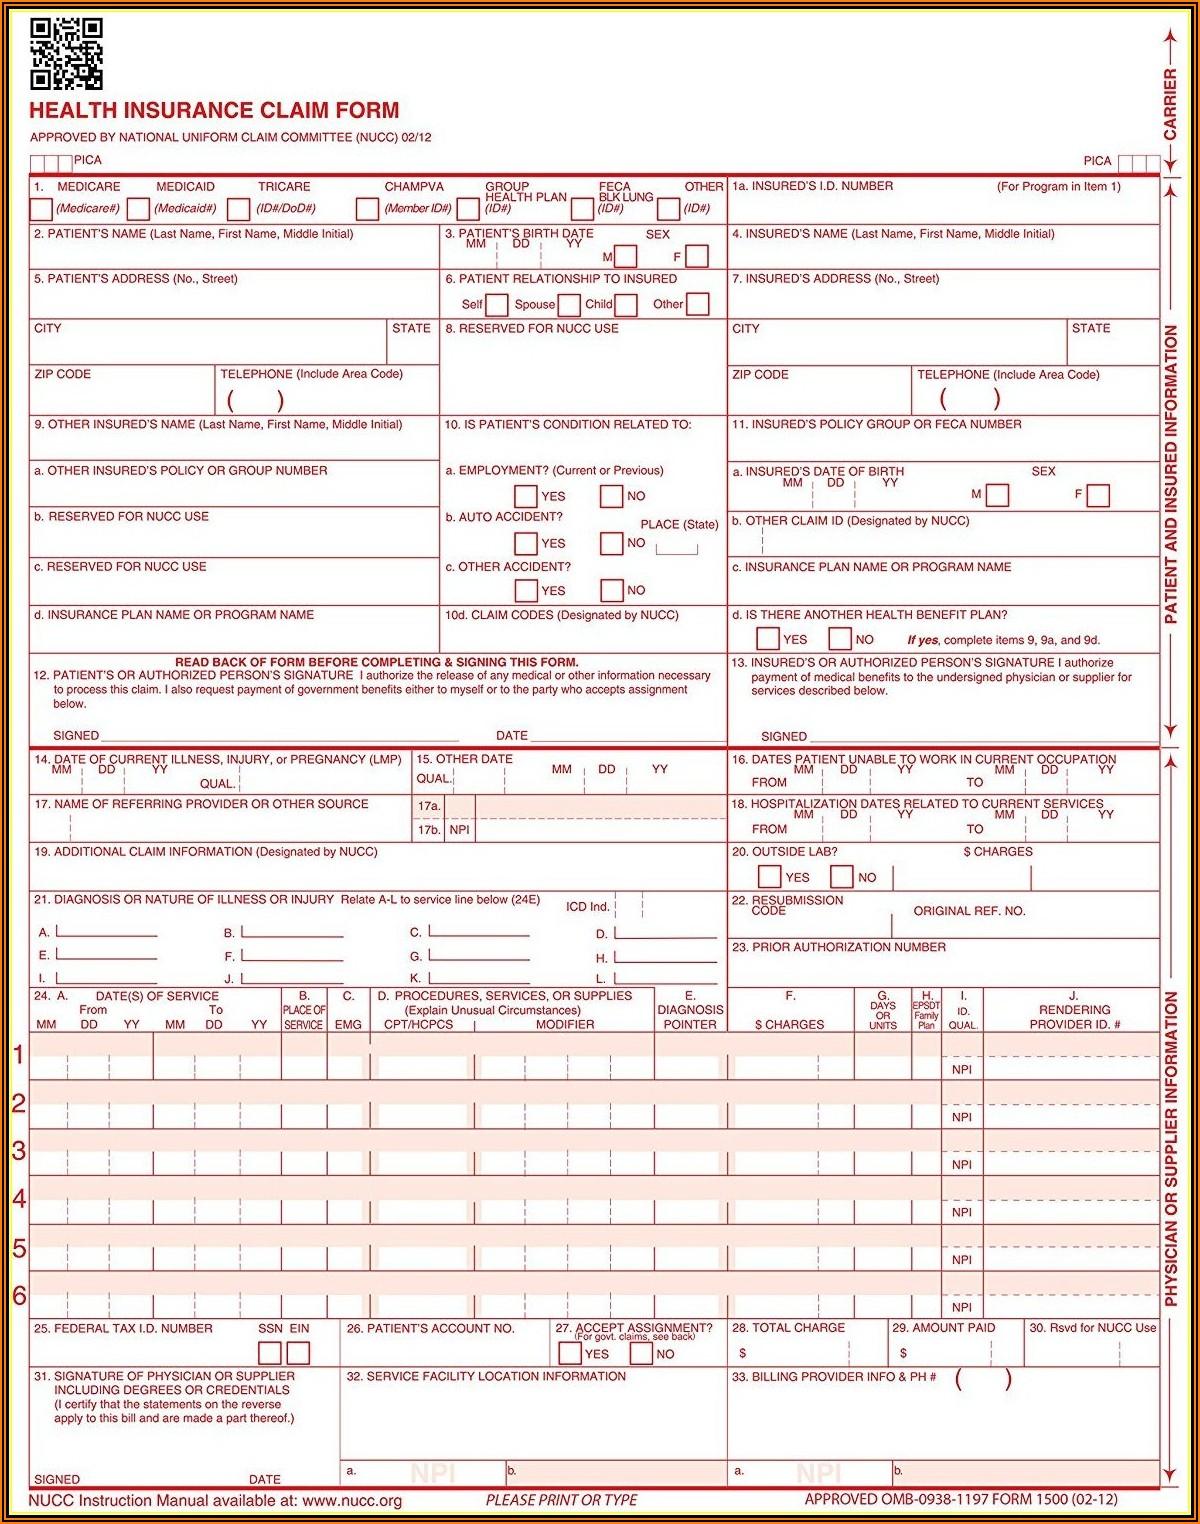 Hcfa Form 1500 Tricare